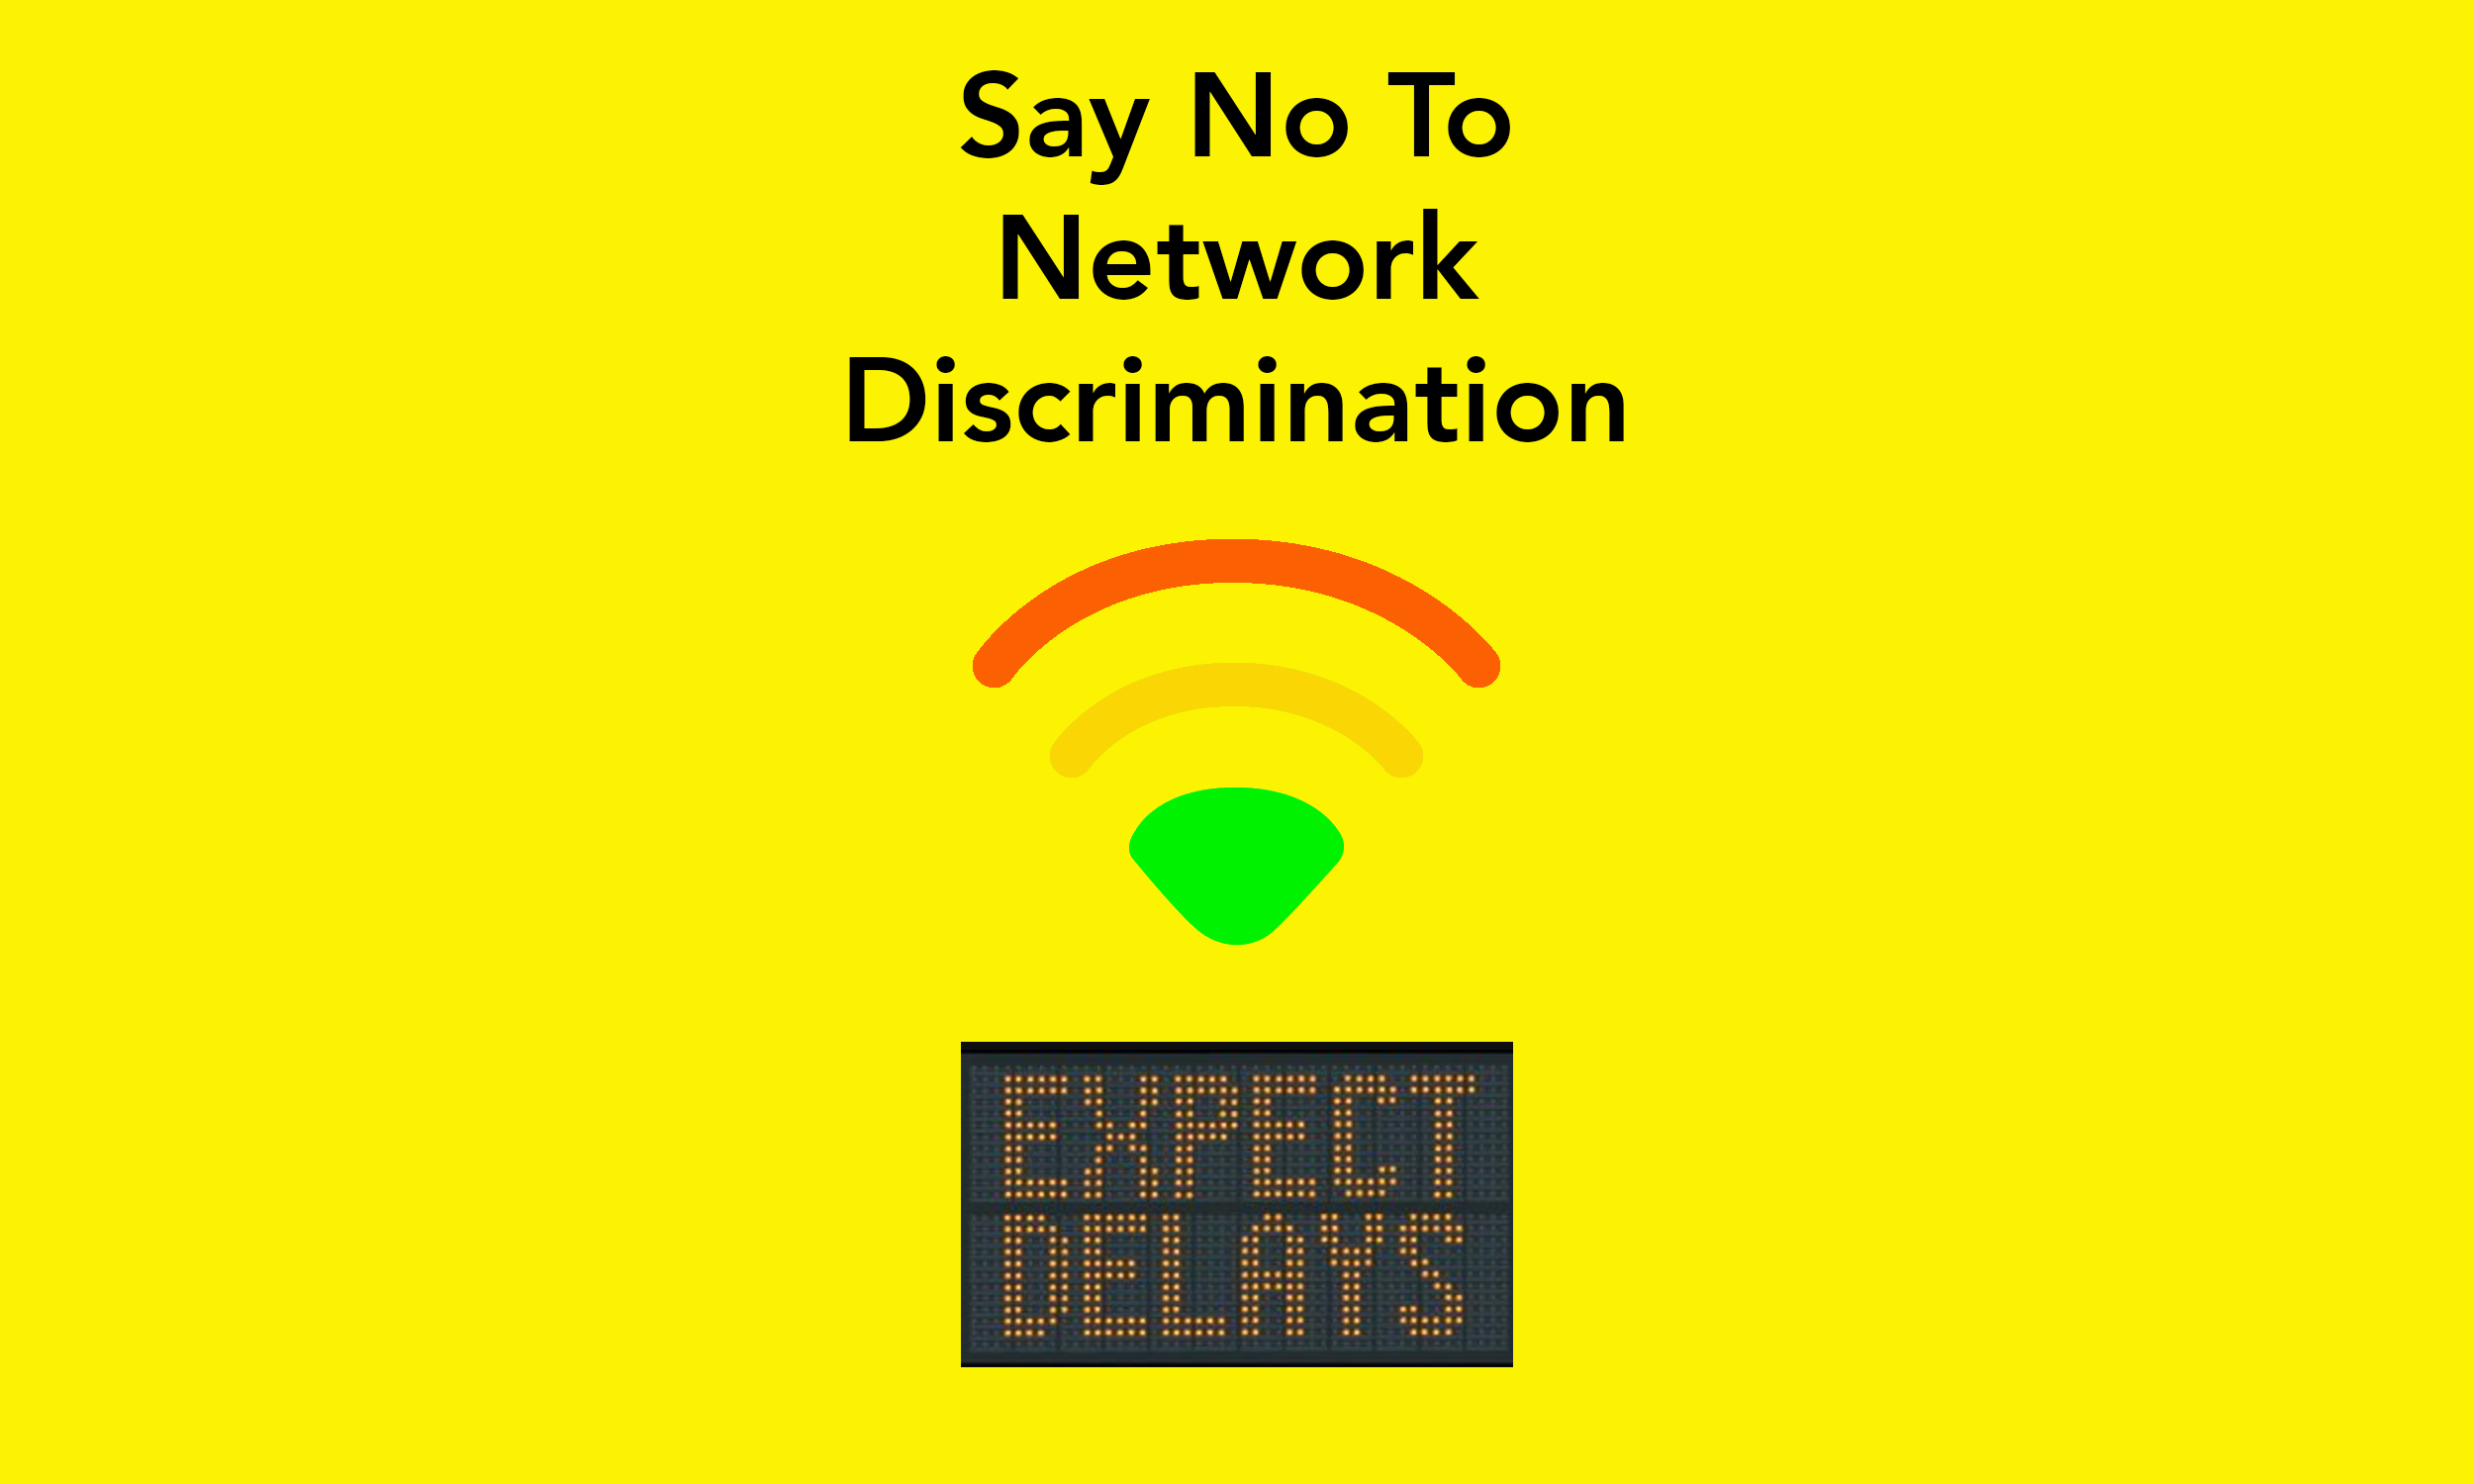 network discrimination